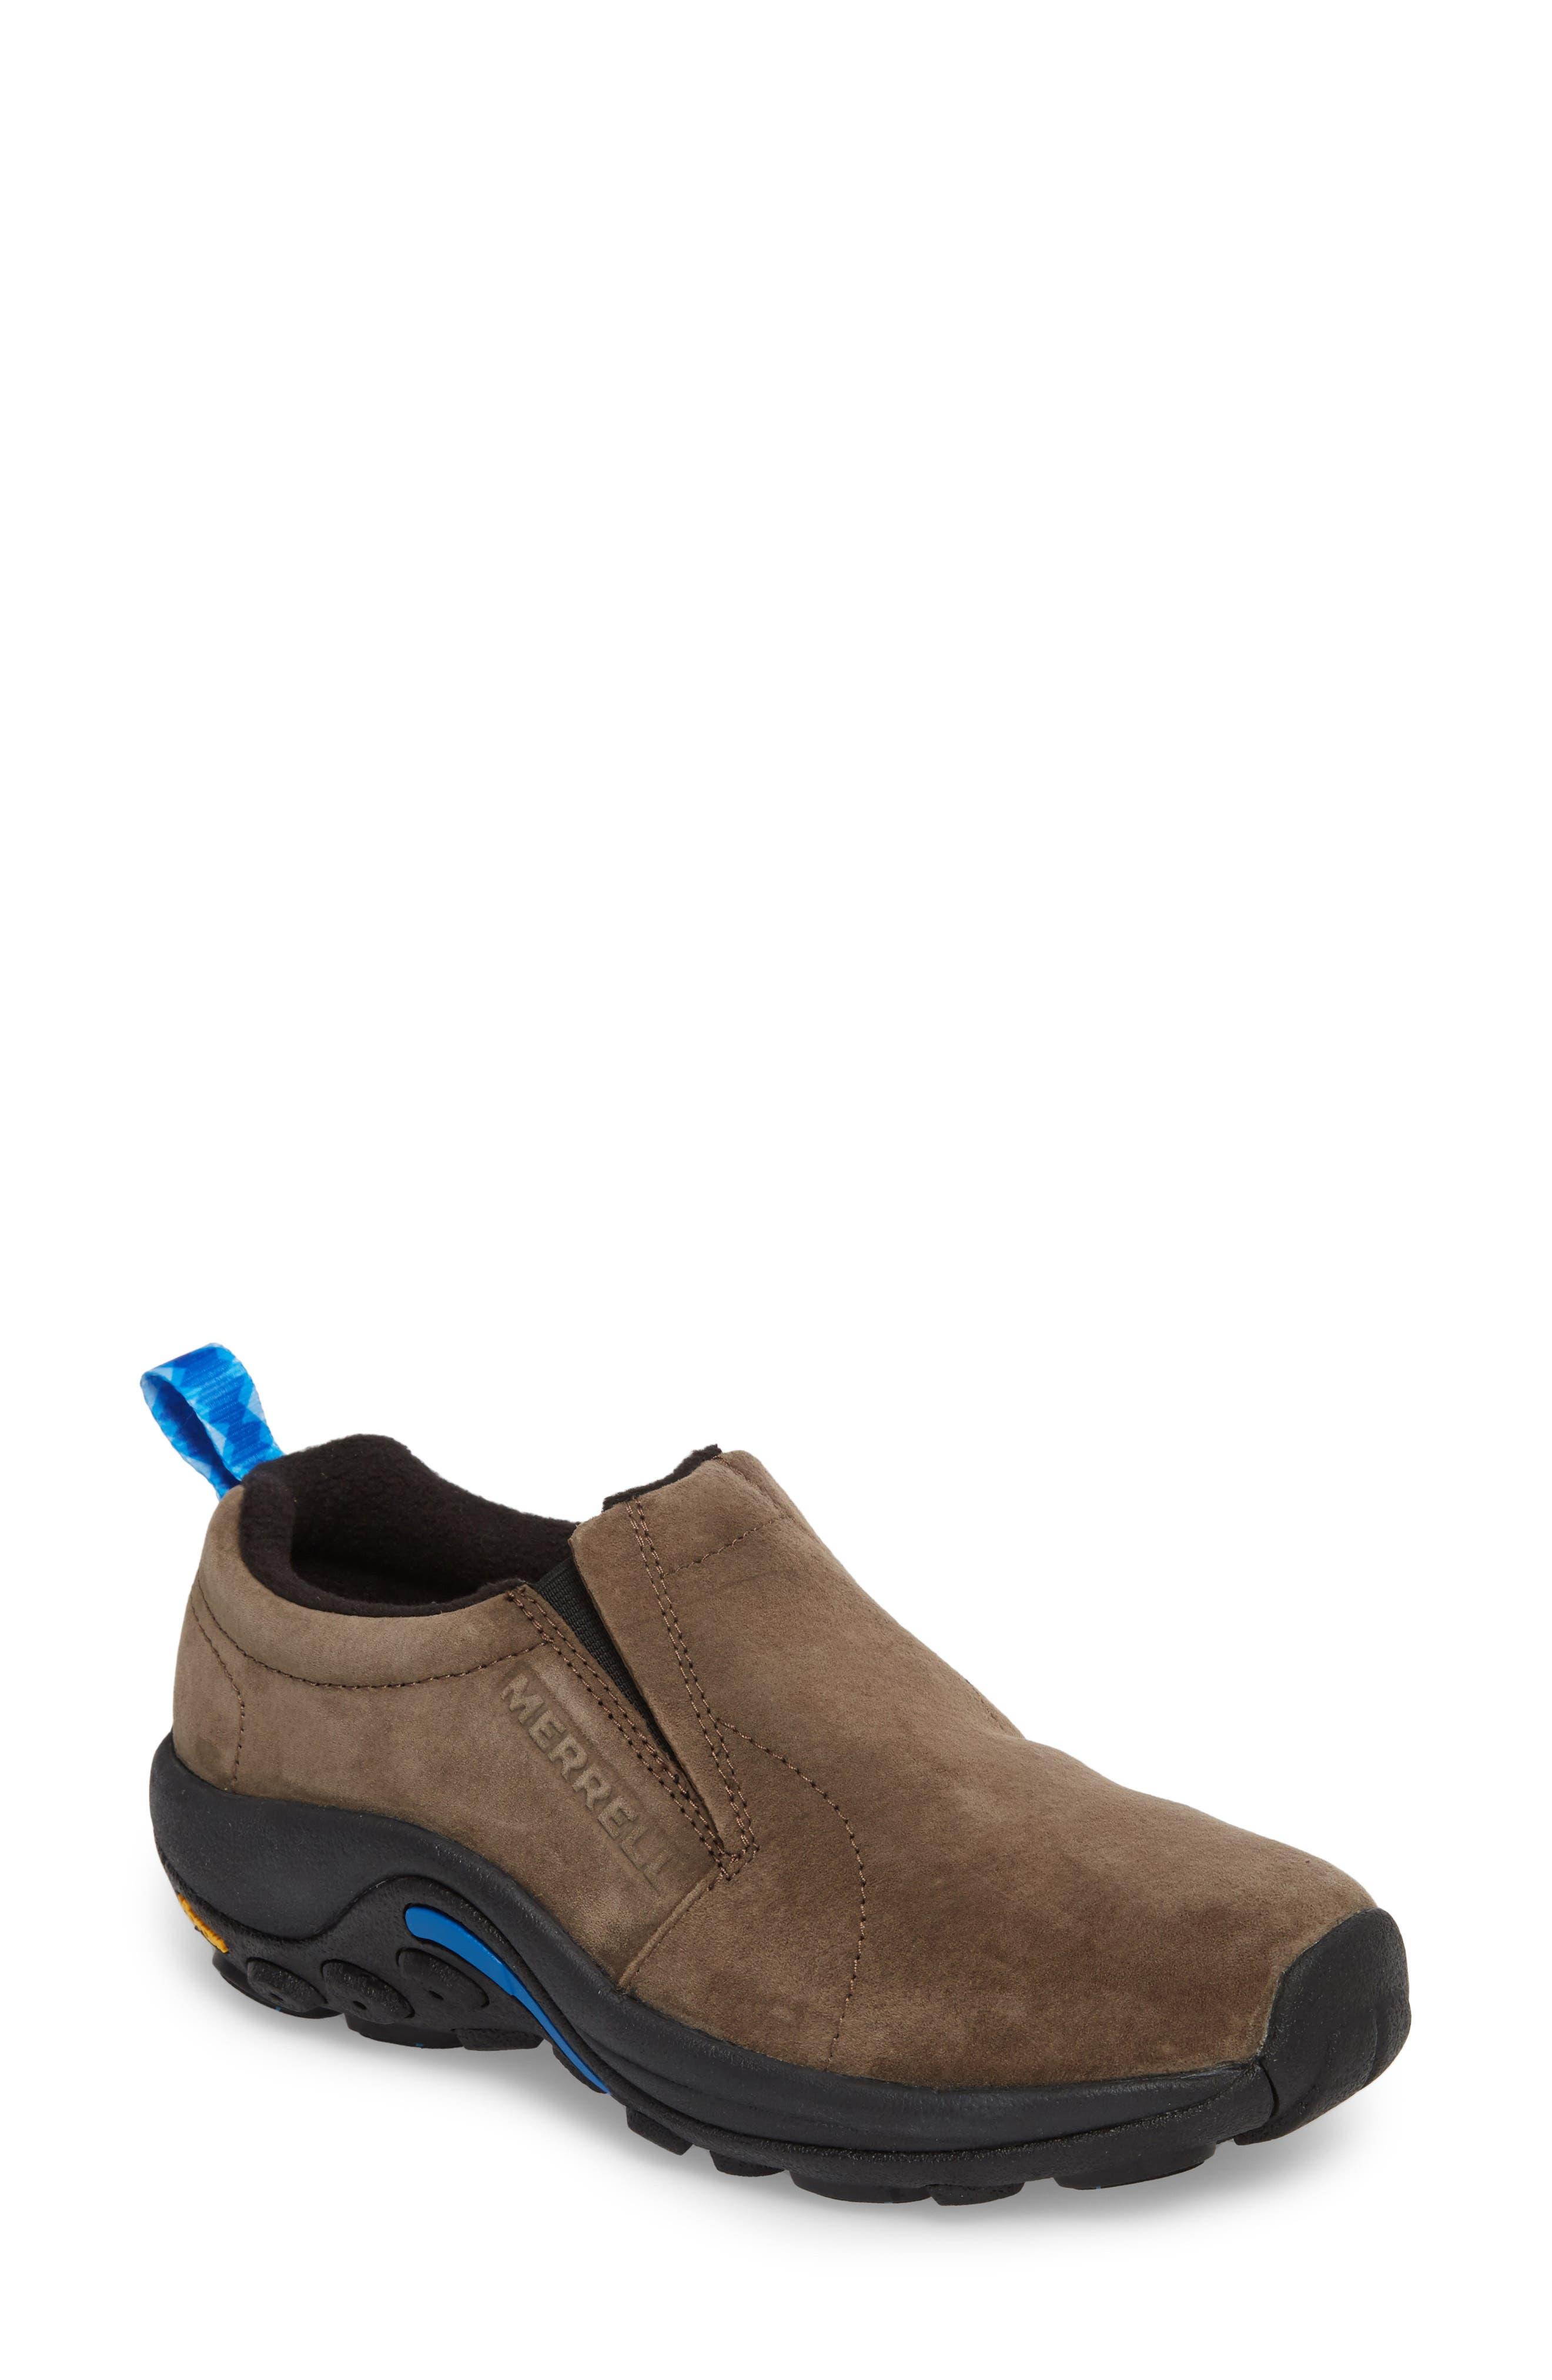 Jungle Moc Ice Waterproof Sneaker,                             Main thumbnail 1, color,                             Gun Smoke Leather